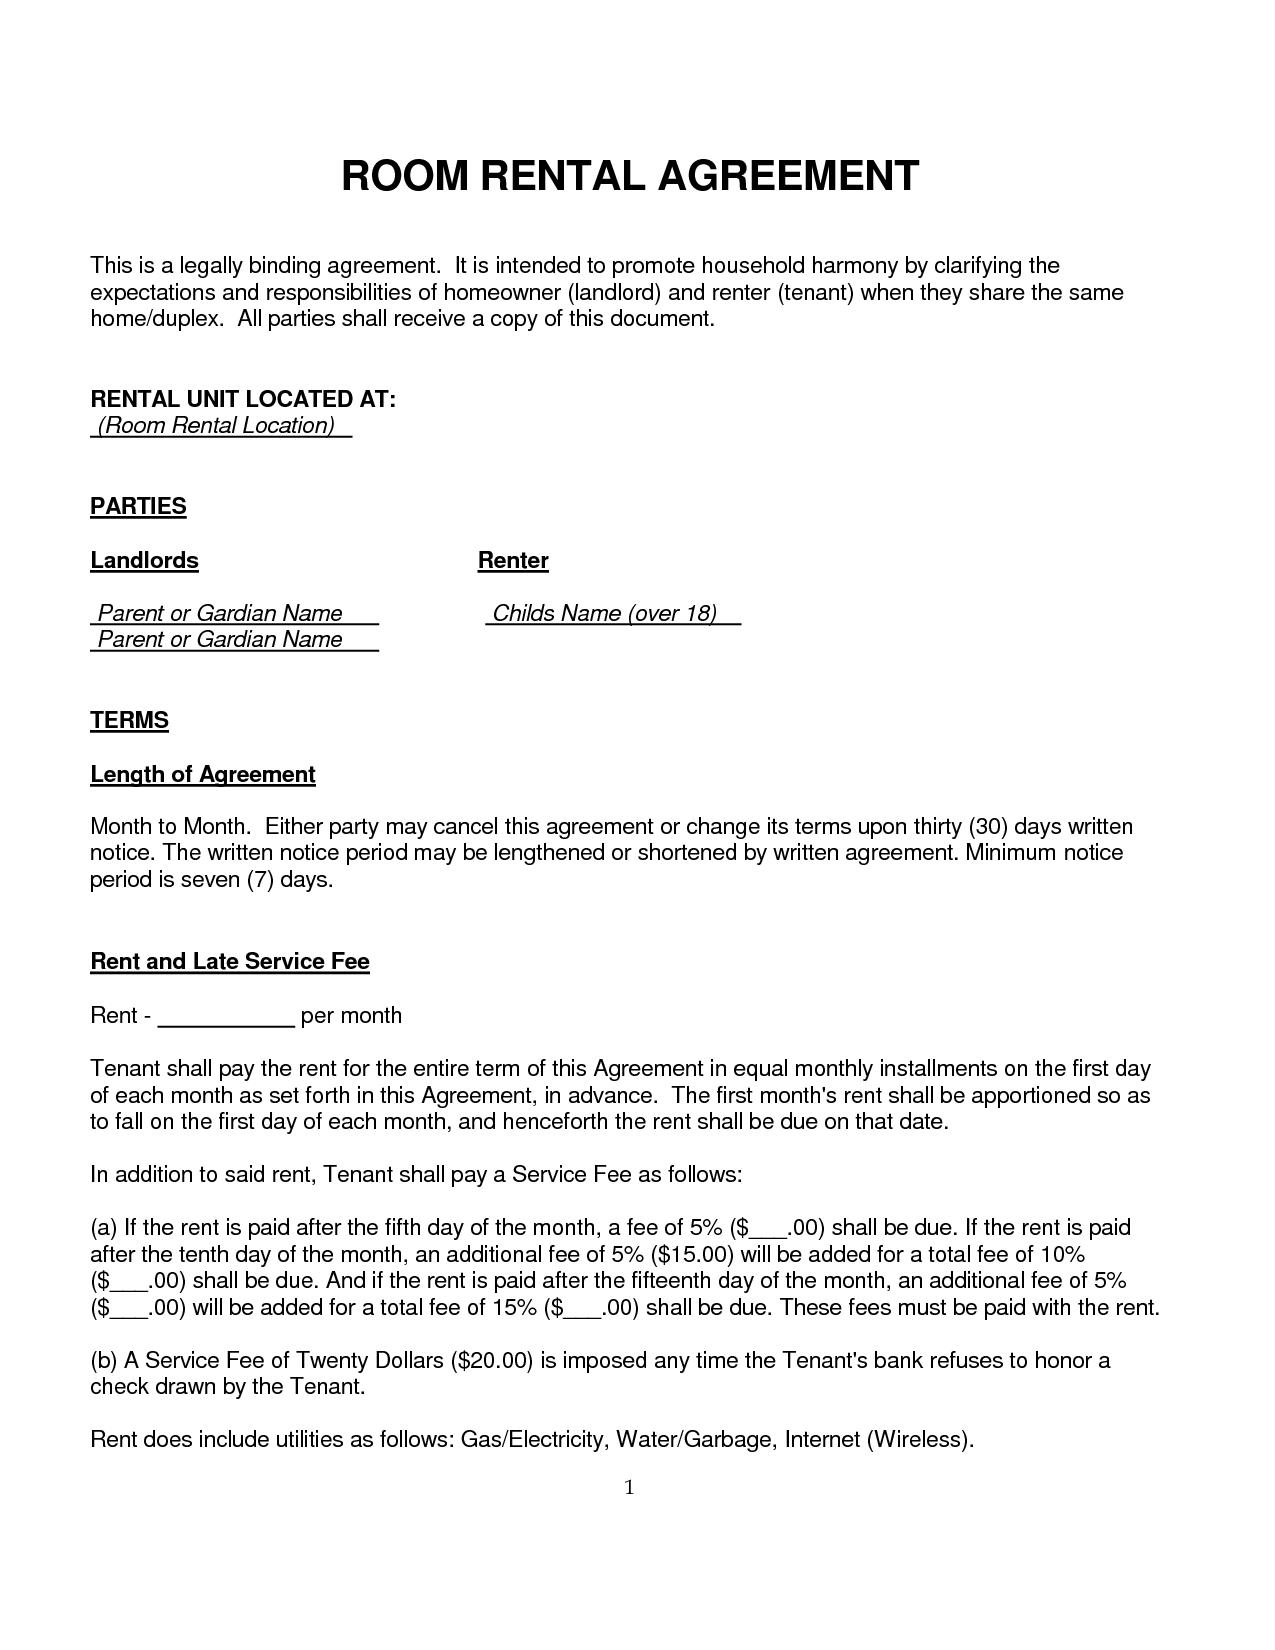 Simple Room Rental Agreement Form Free Uk